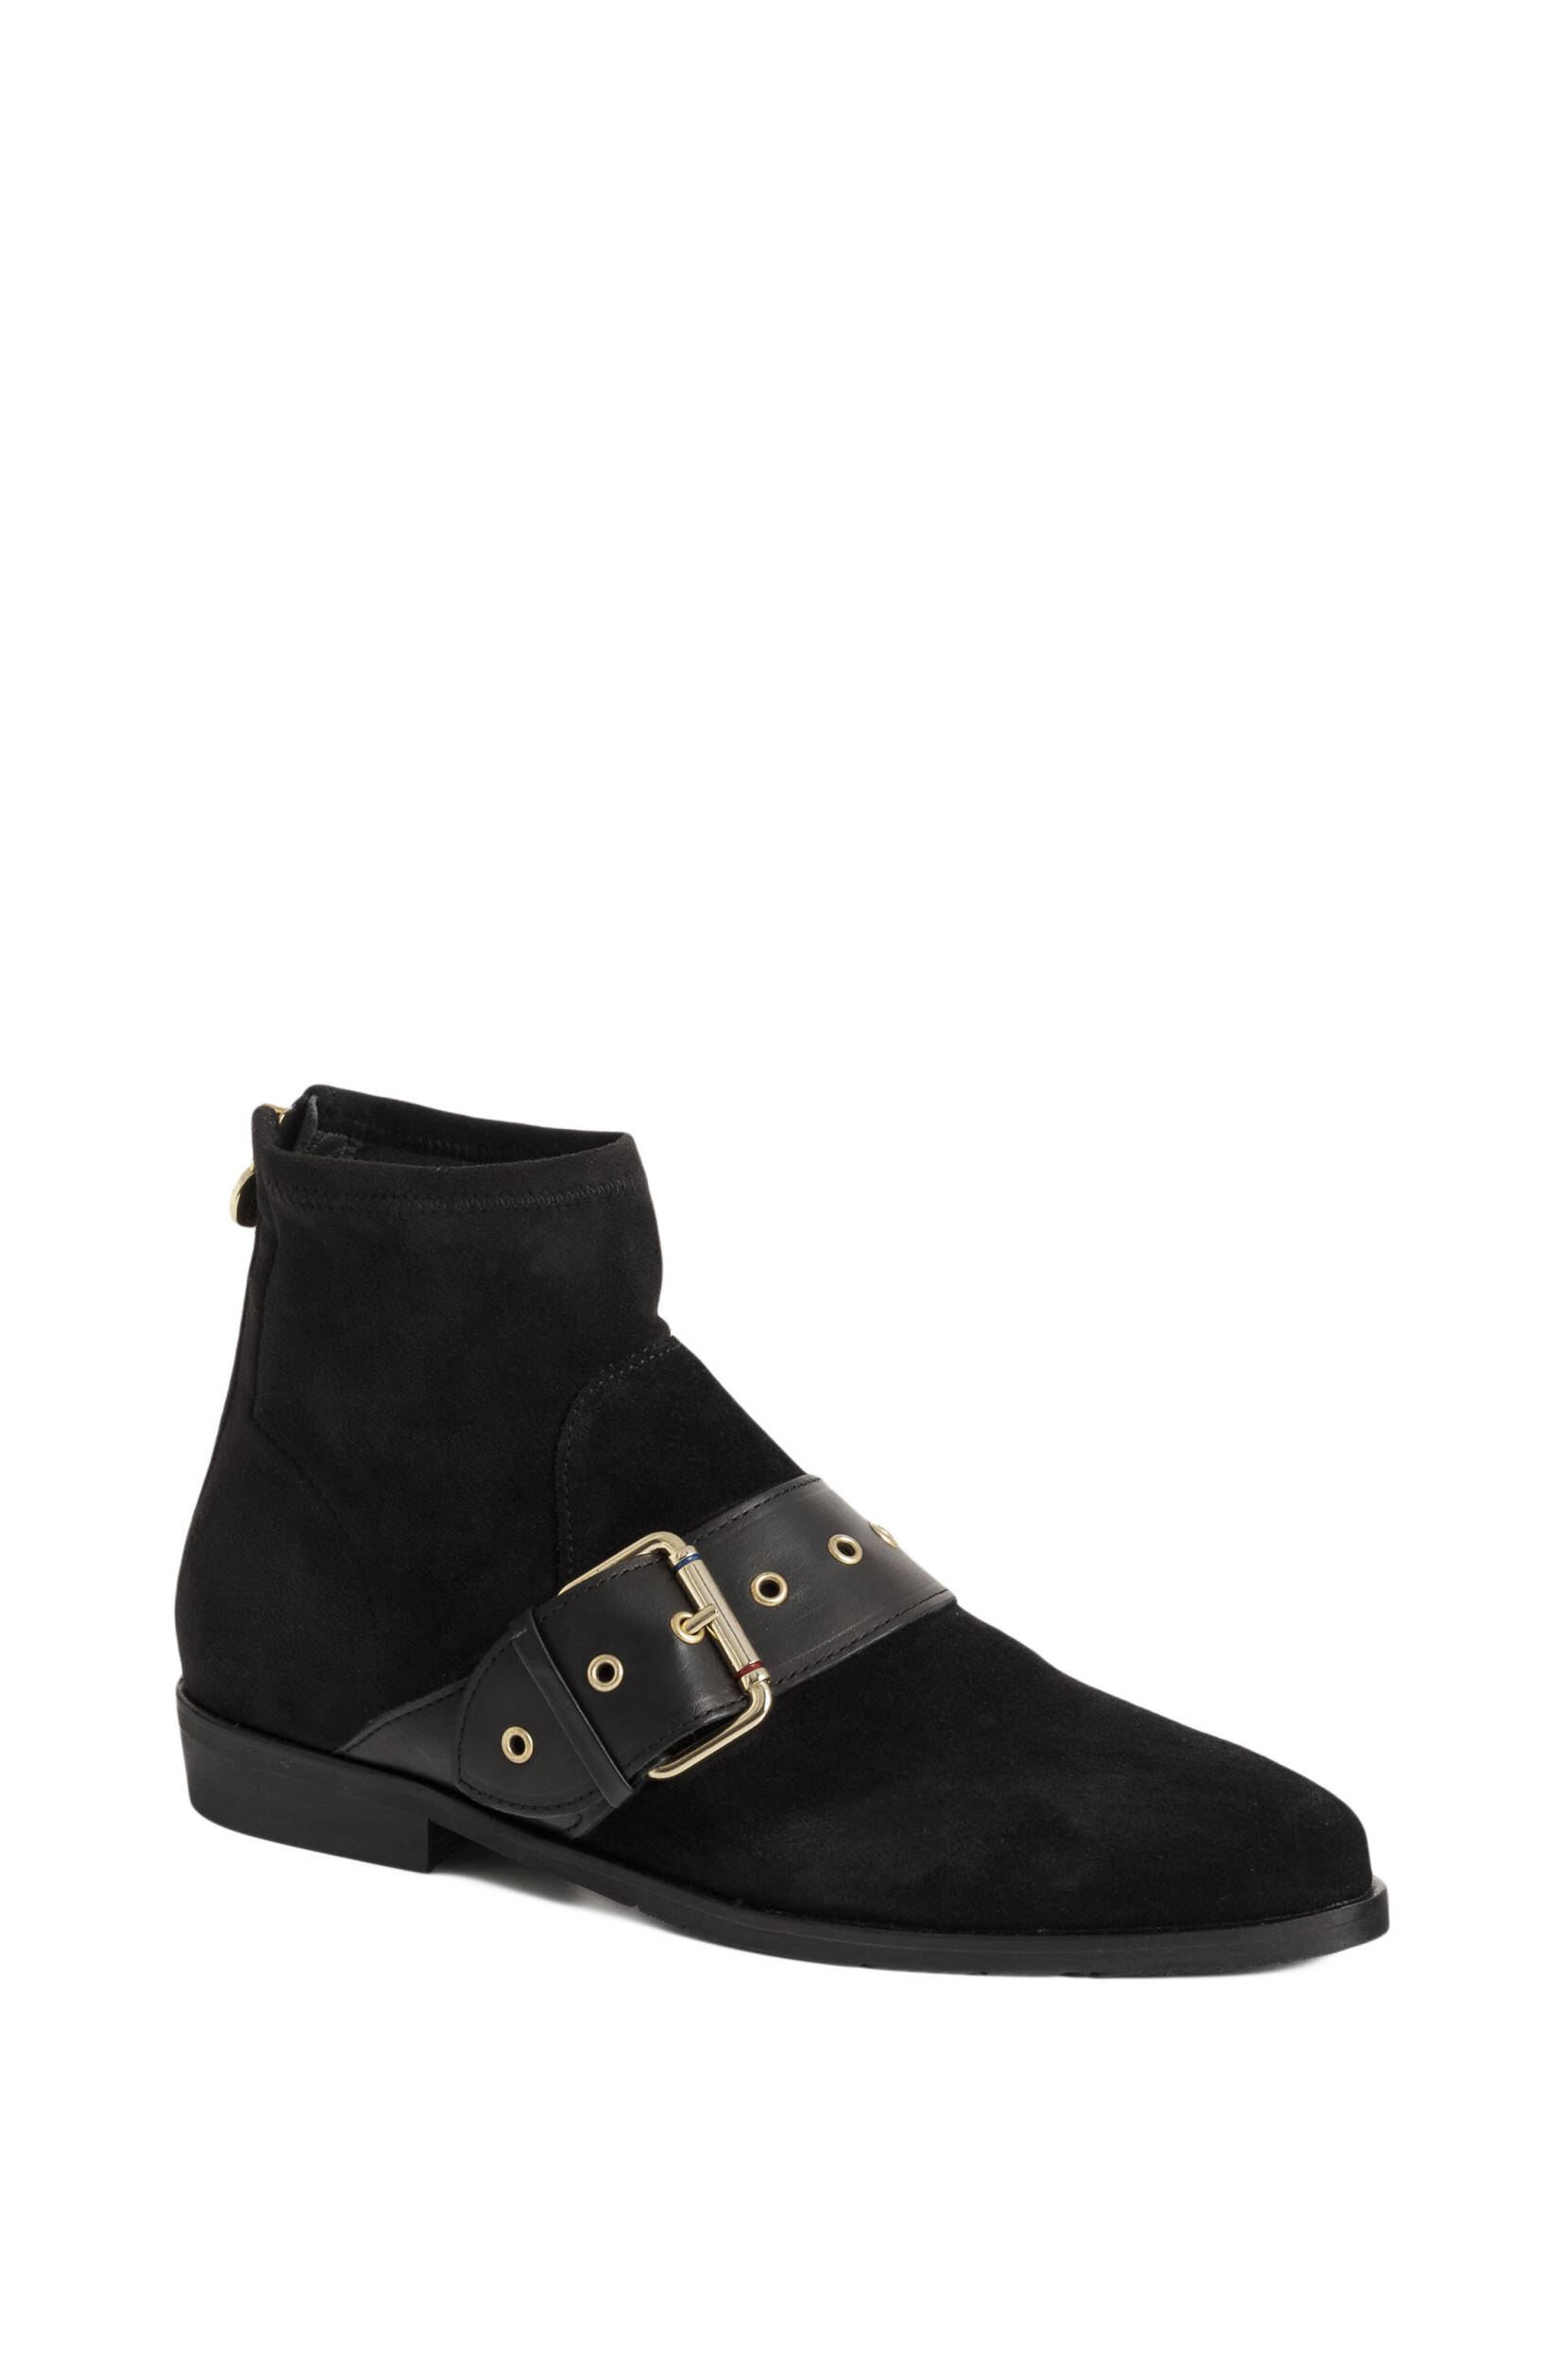 5eb8784c6a74 Ankle boots Gigi Hadid Flat Boot Tommy Hilfiger